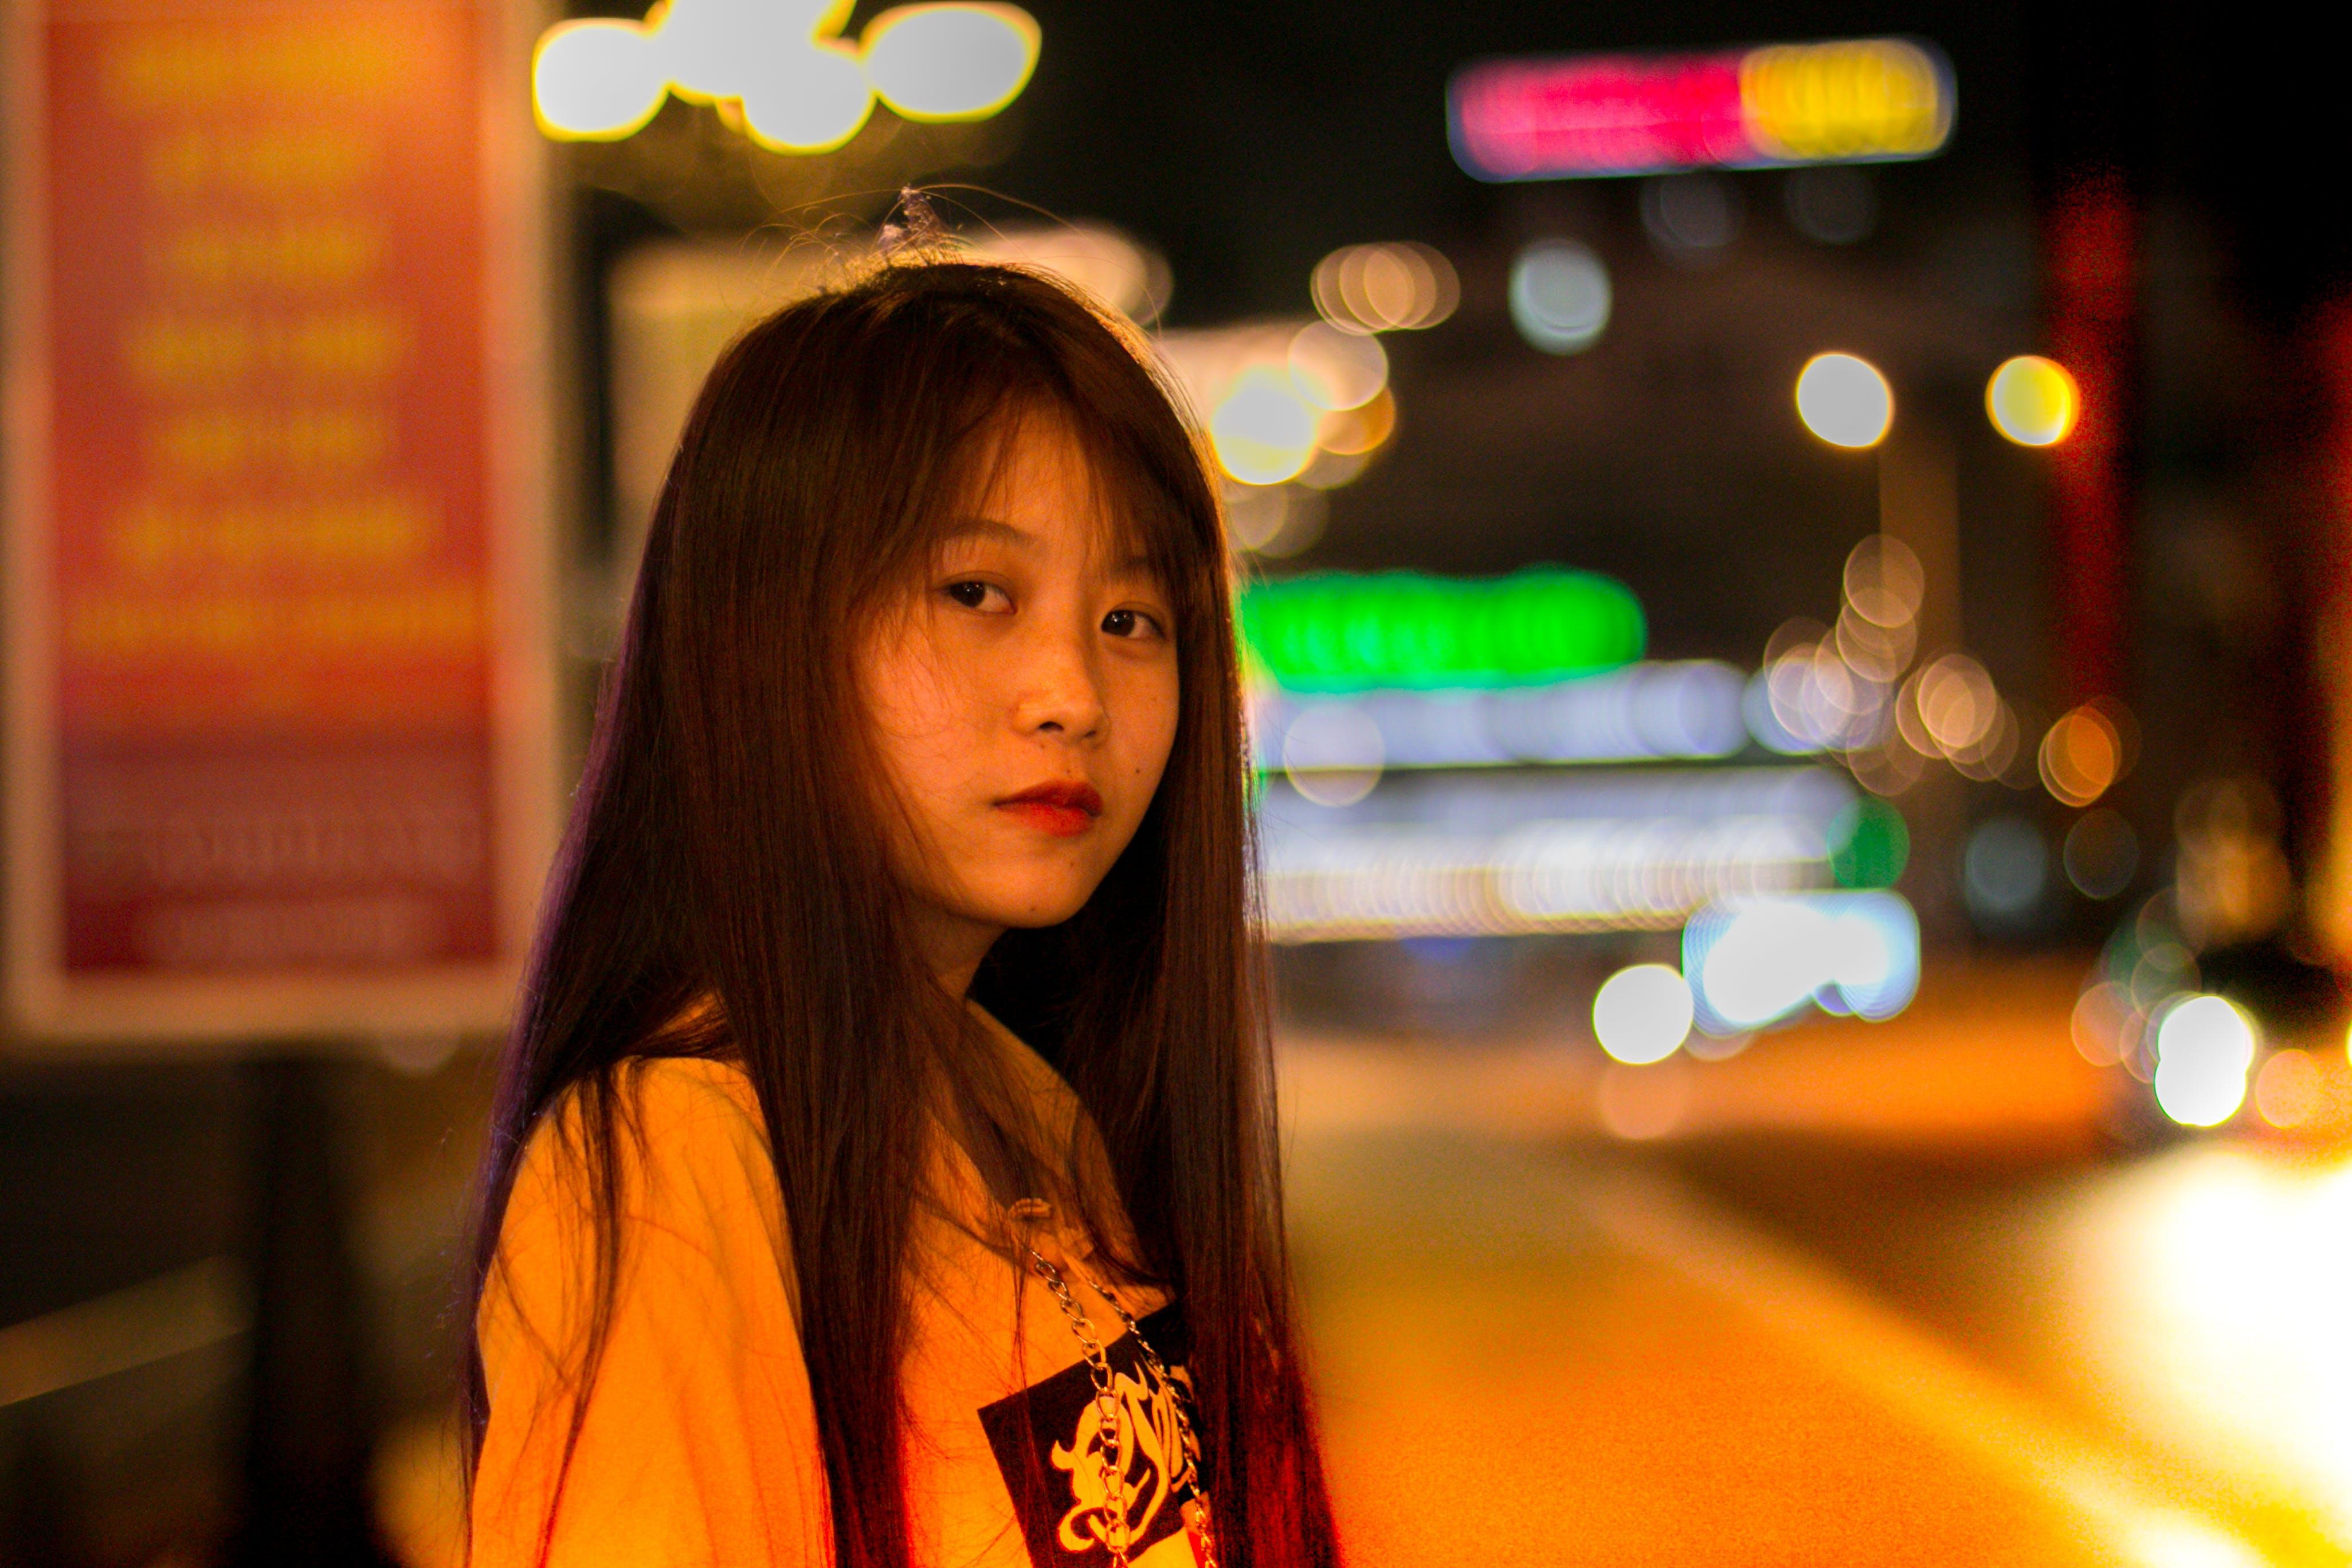 Selective Focus Photo of Woman Wearing Yellow Shirt